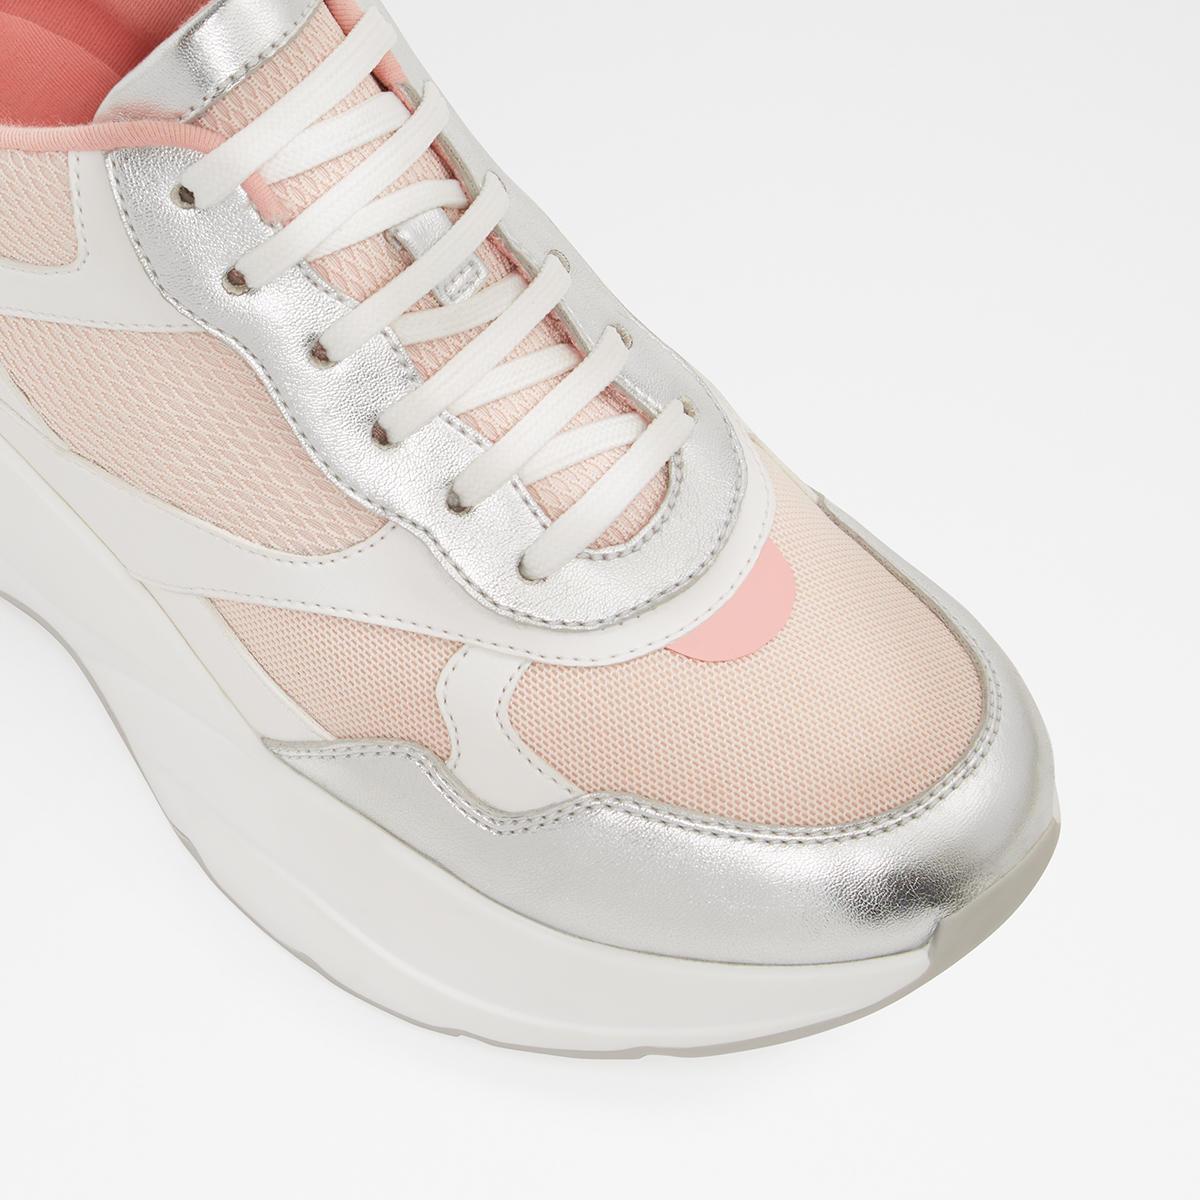 397159d95b48 Merurka Light Pink Women s Sneakers